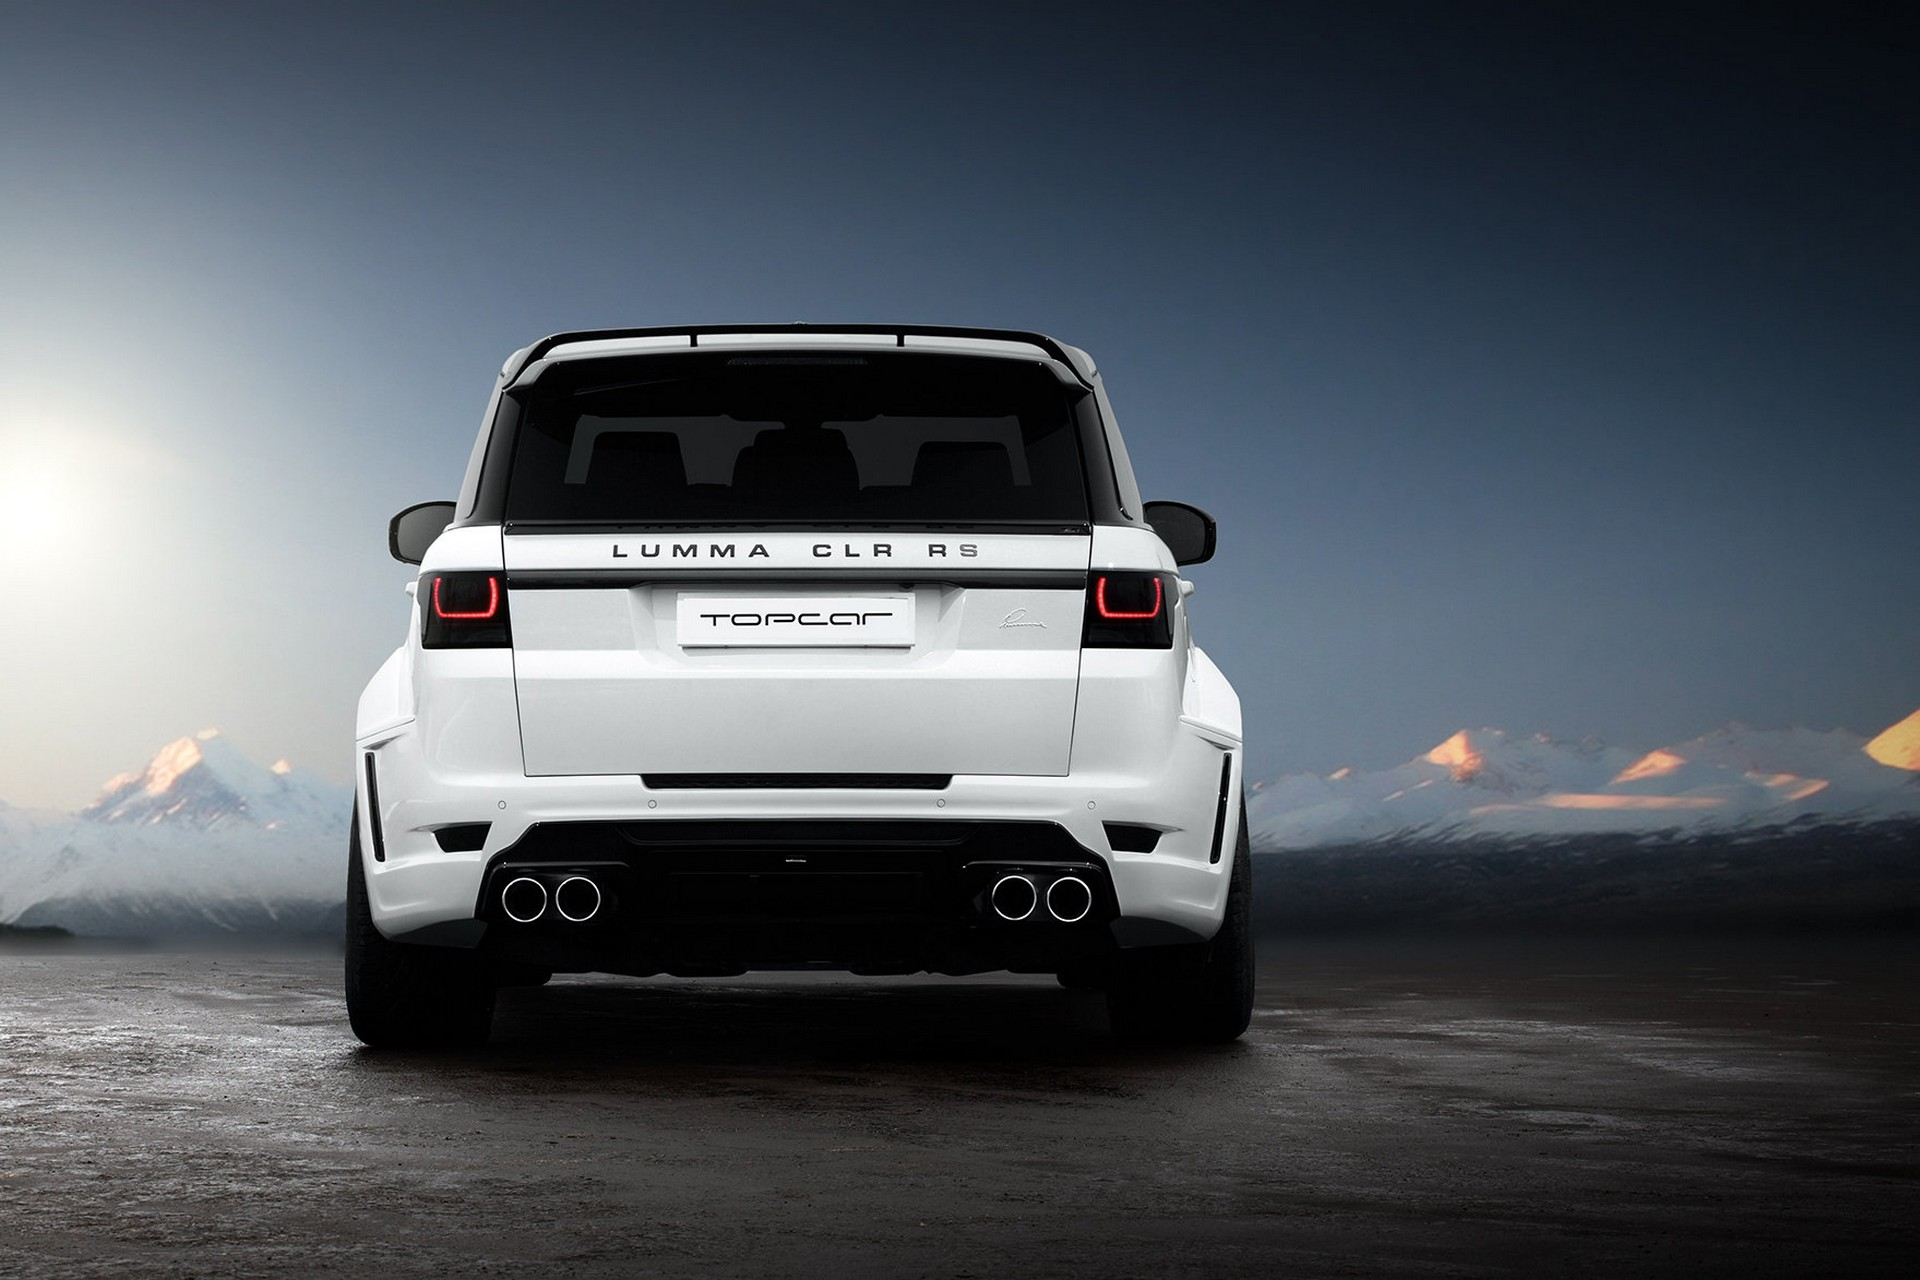 Range Rover Sport Lumma Clr Rs Topcar